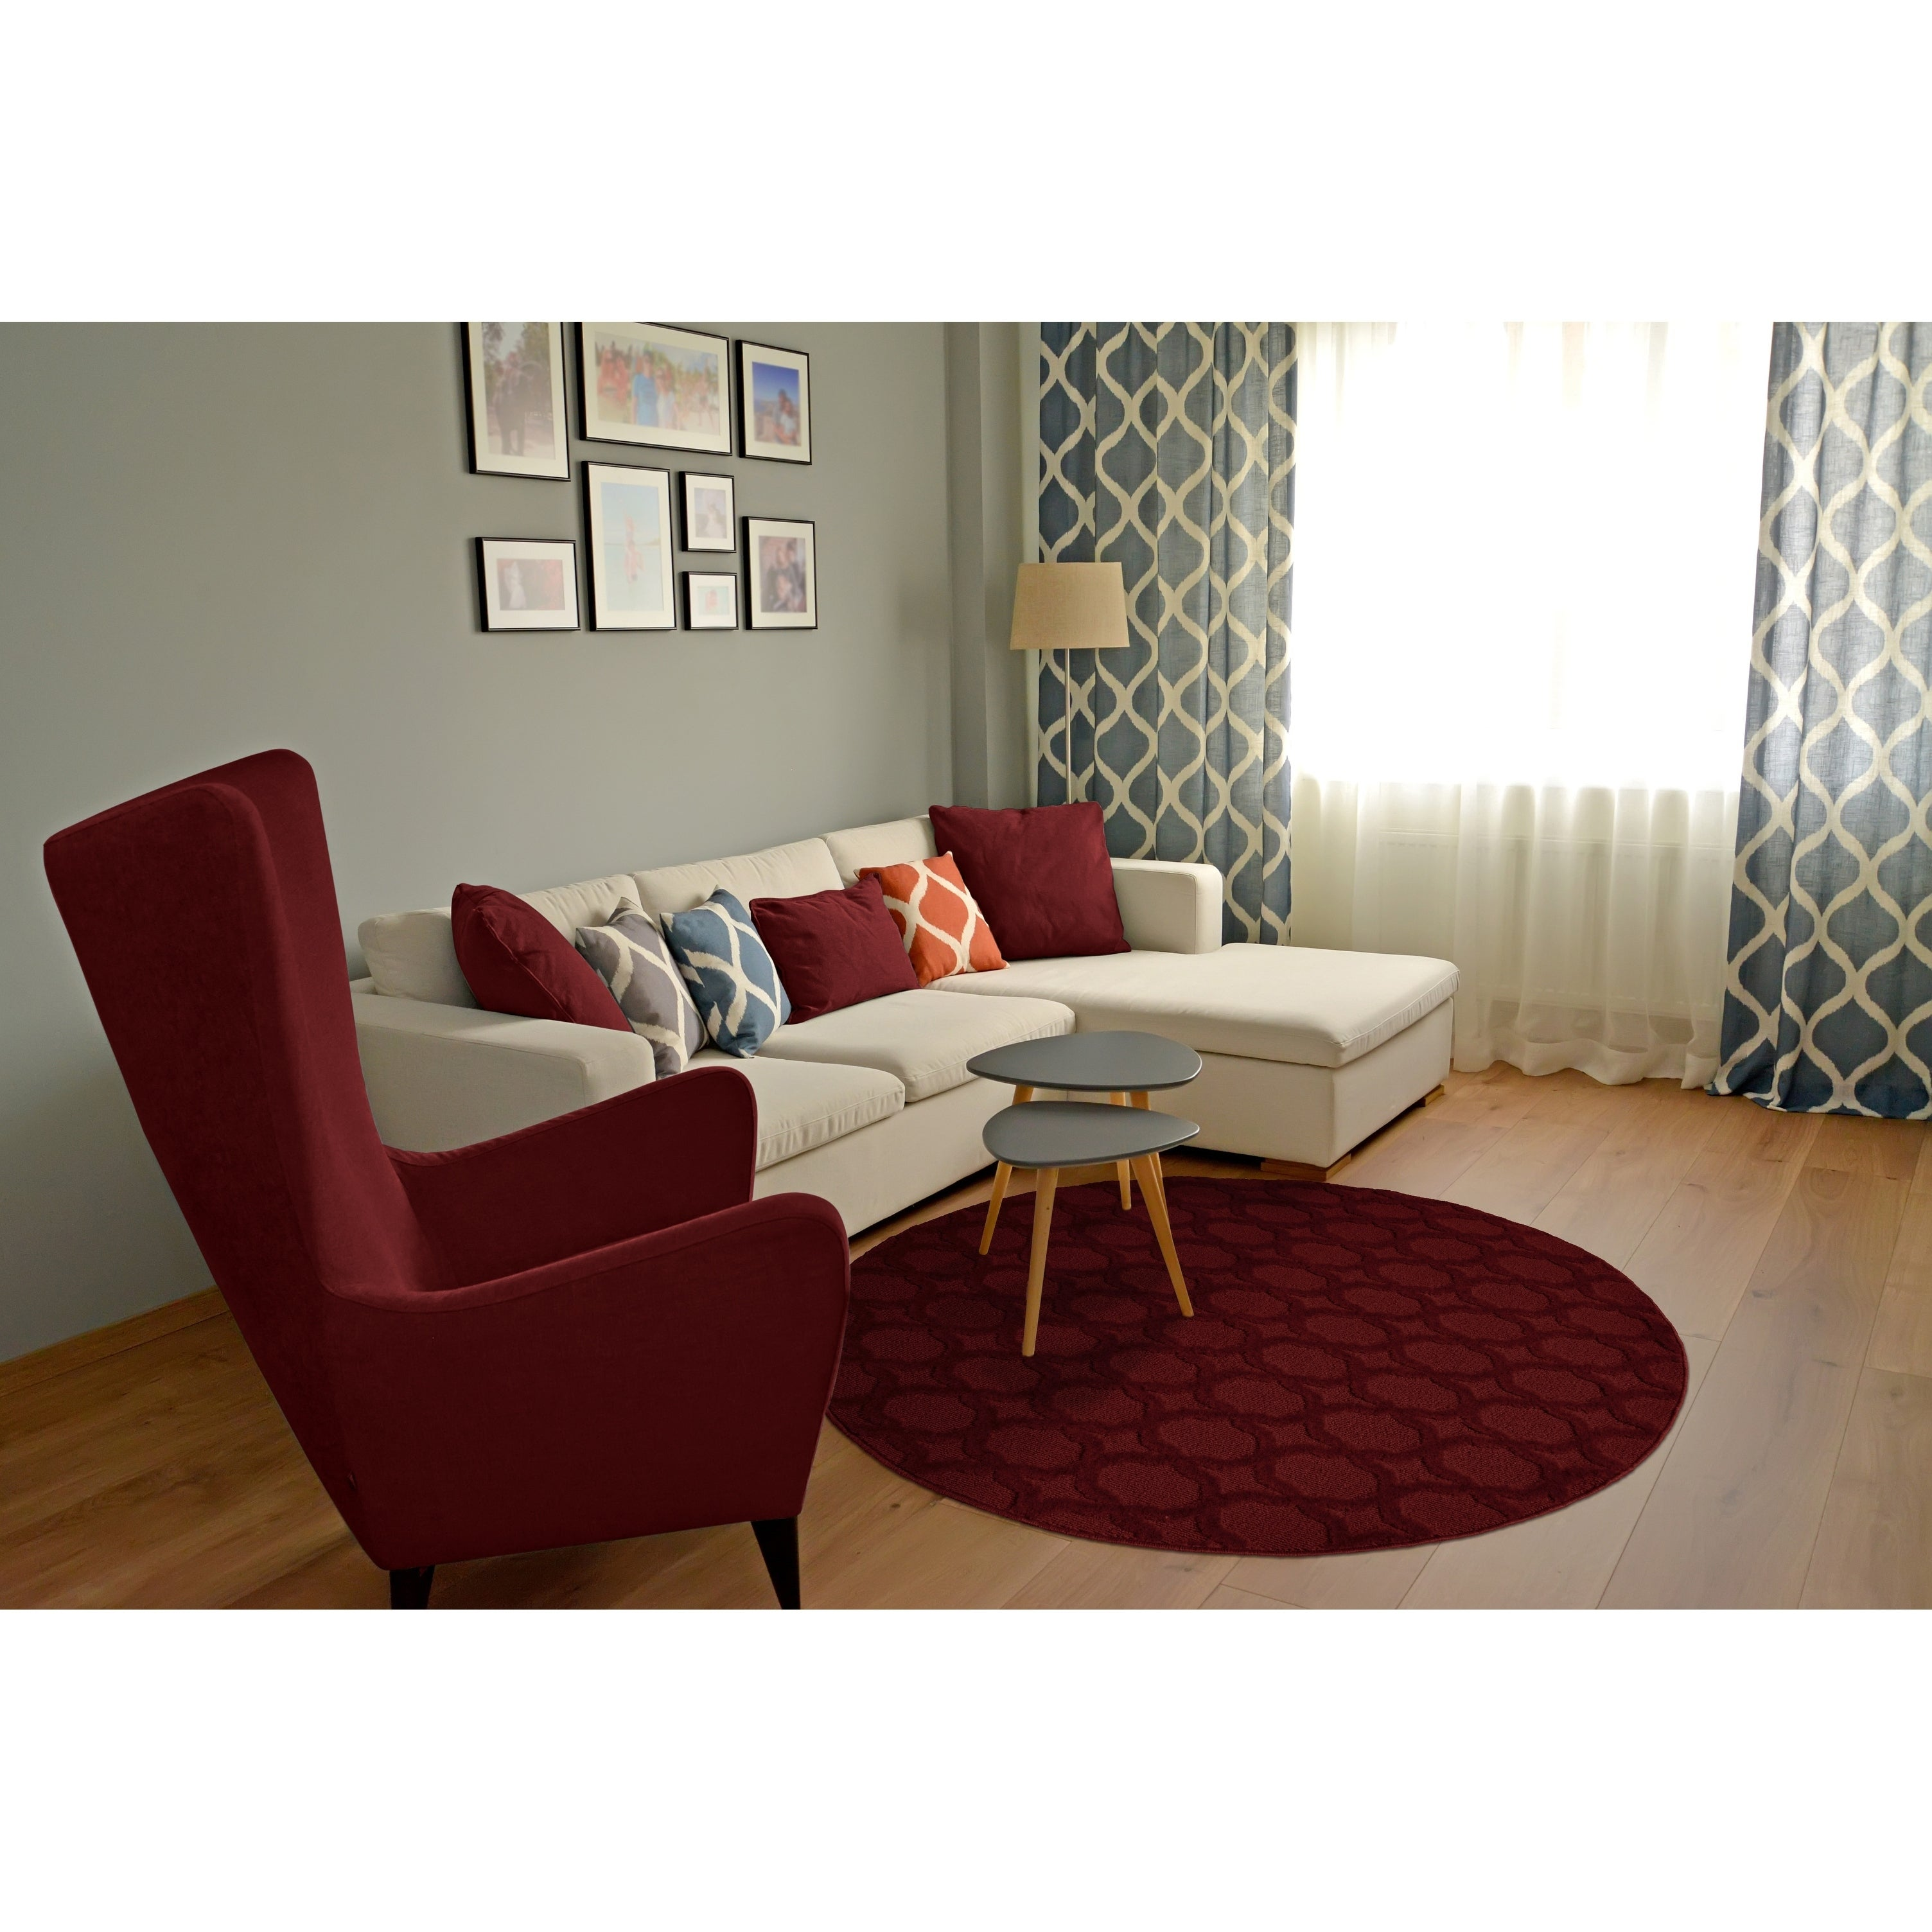 Sparta 5 Round Living Room Area Rug